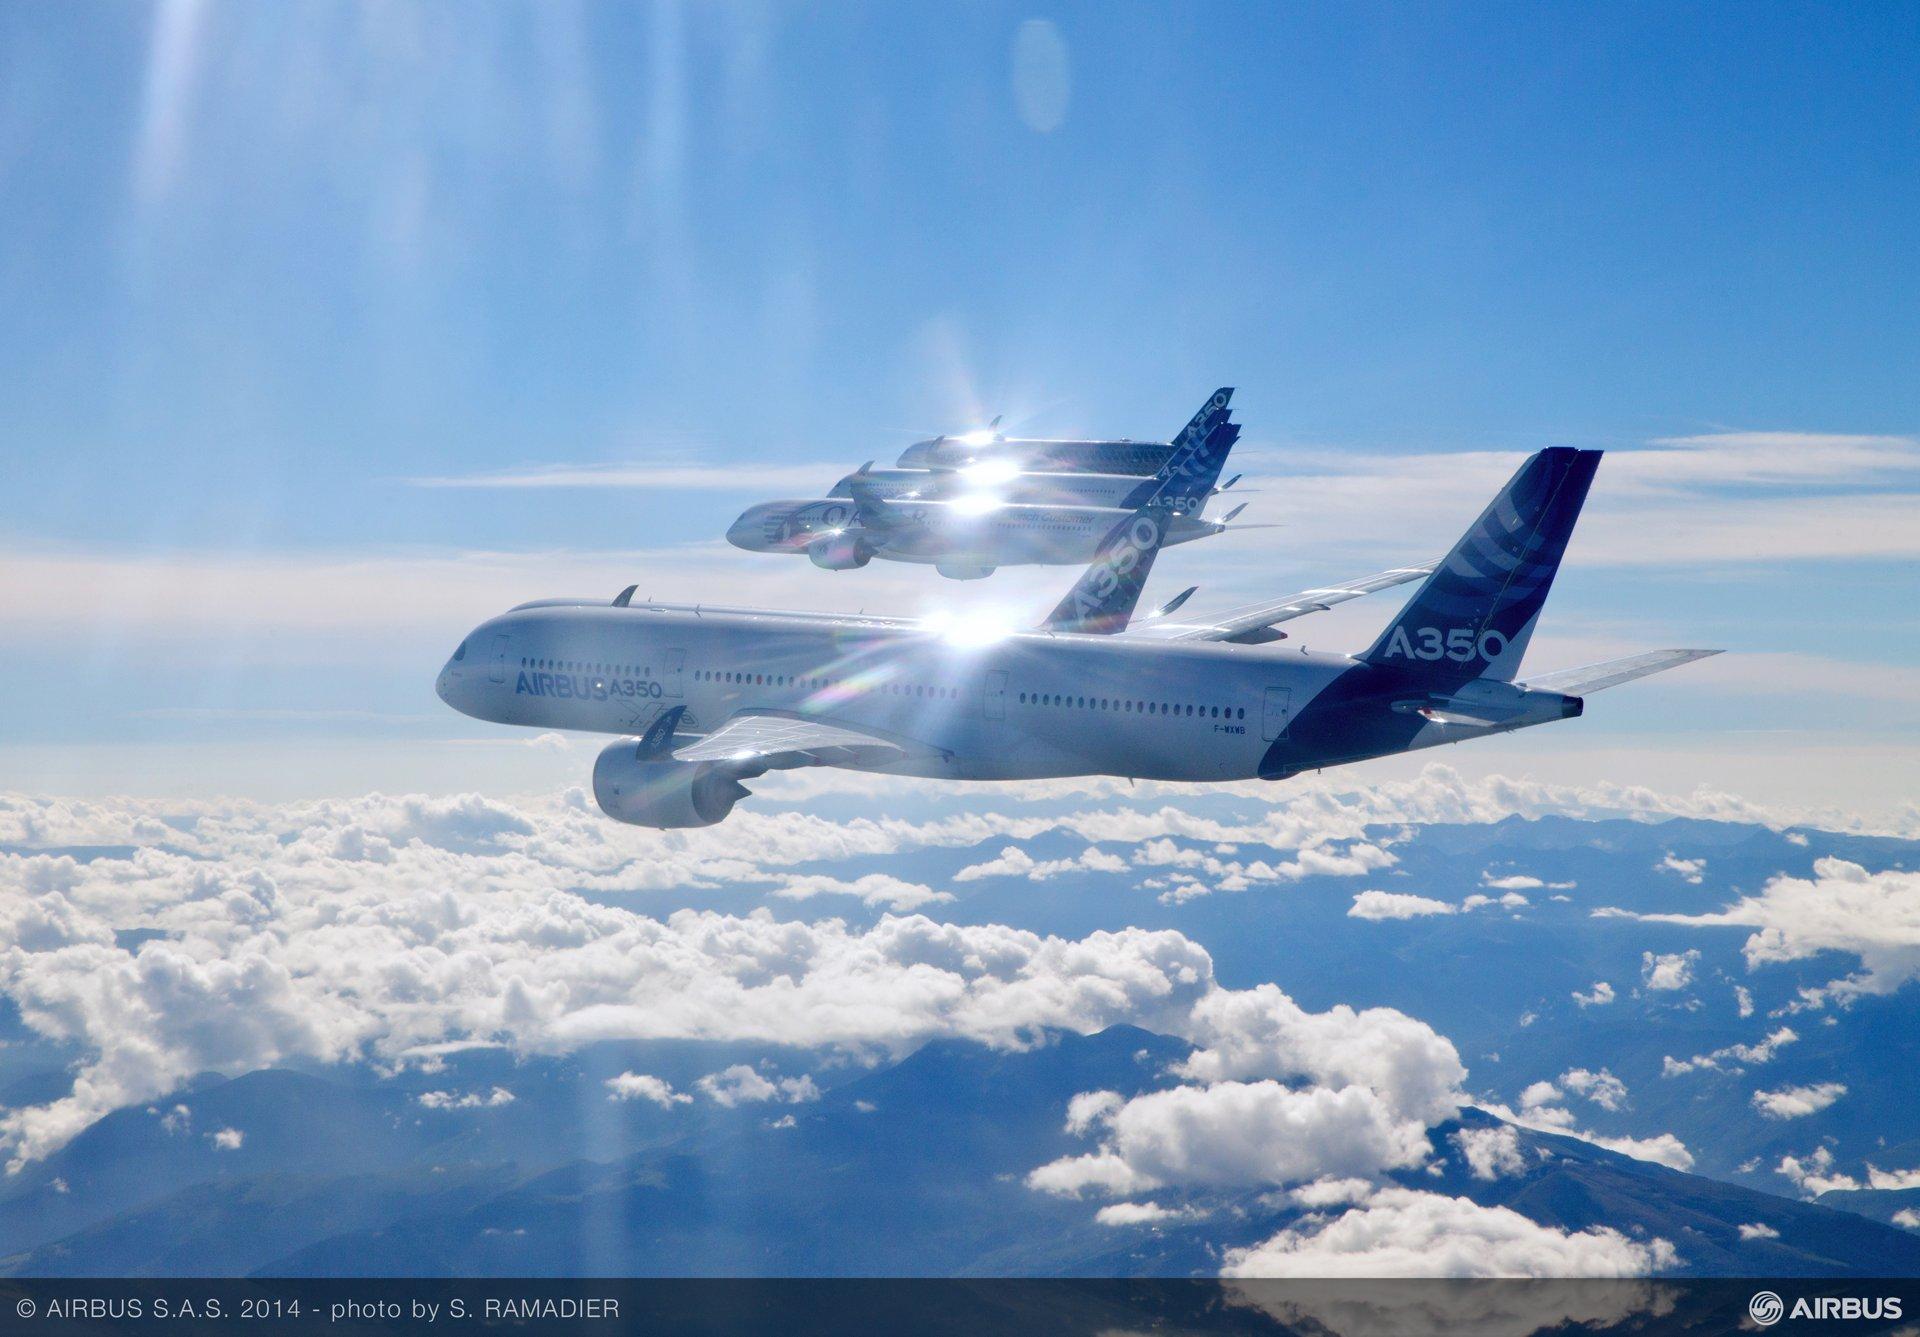 A350 XWB – Formation flight 4